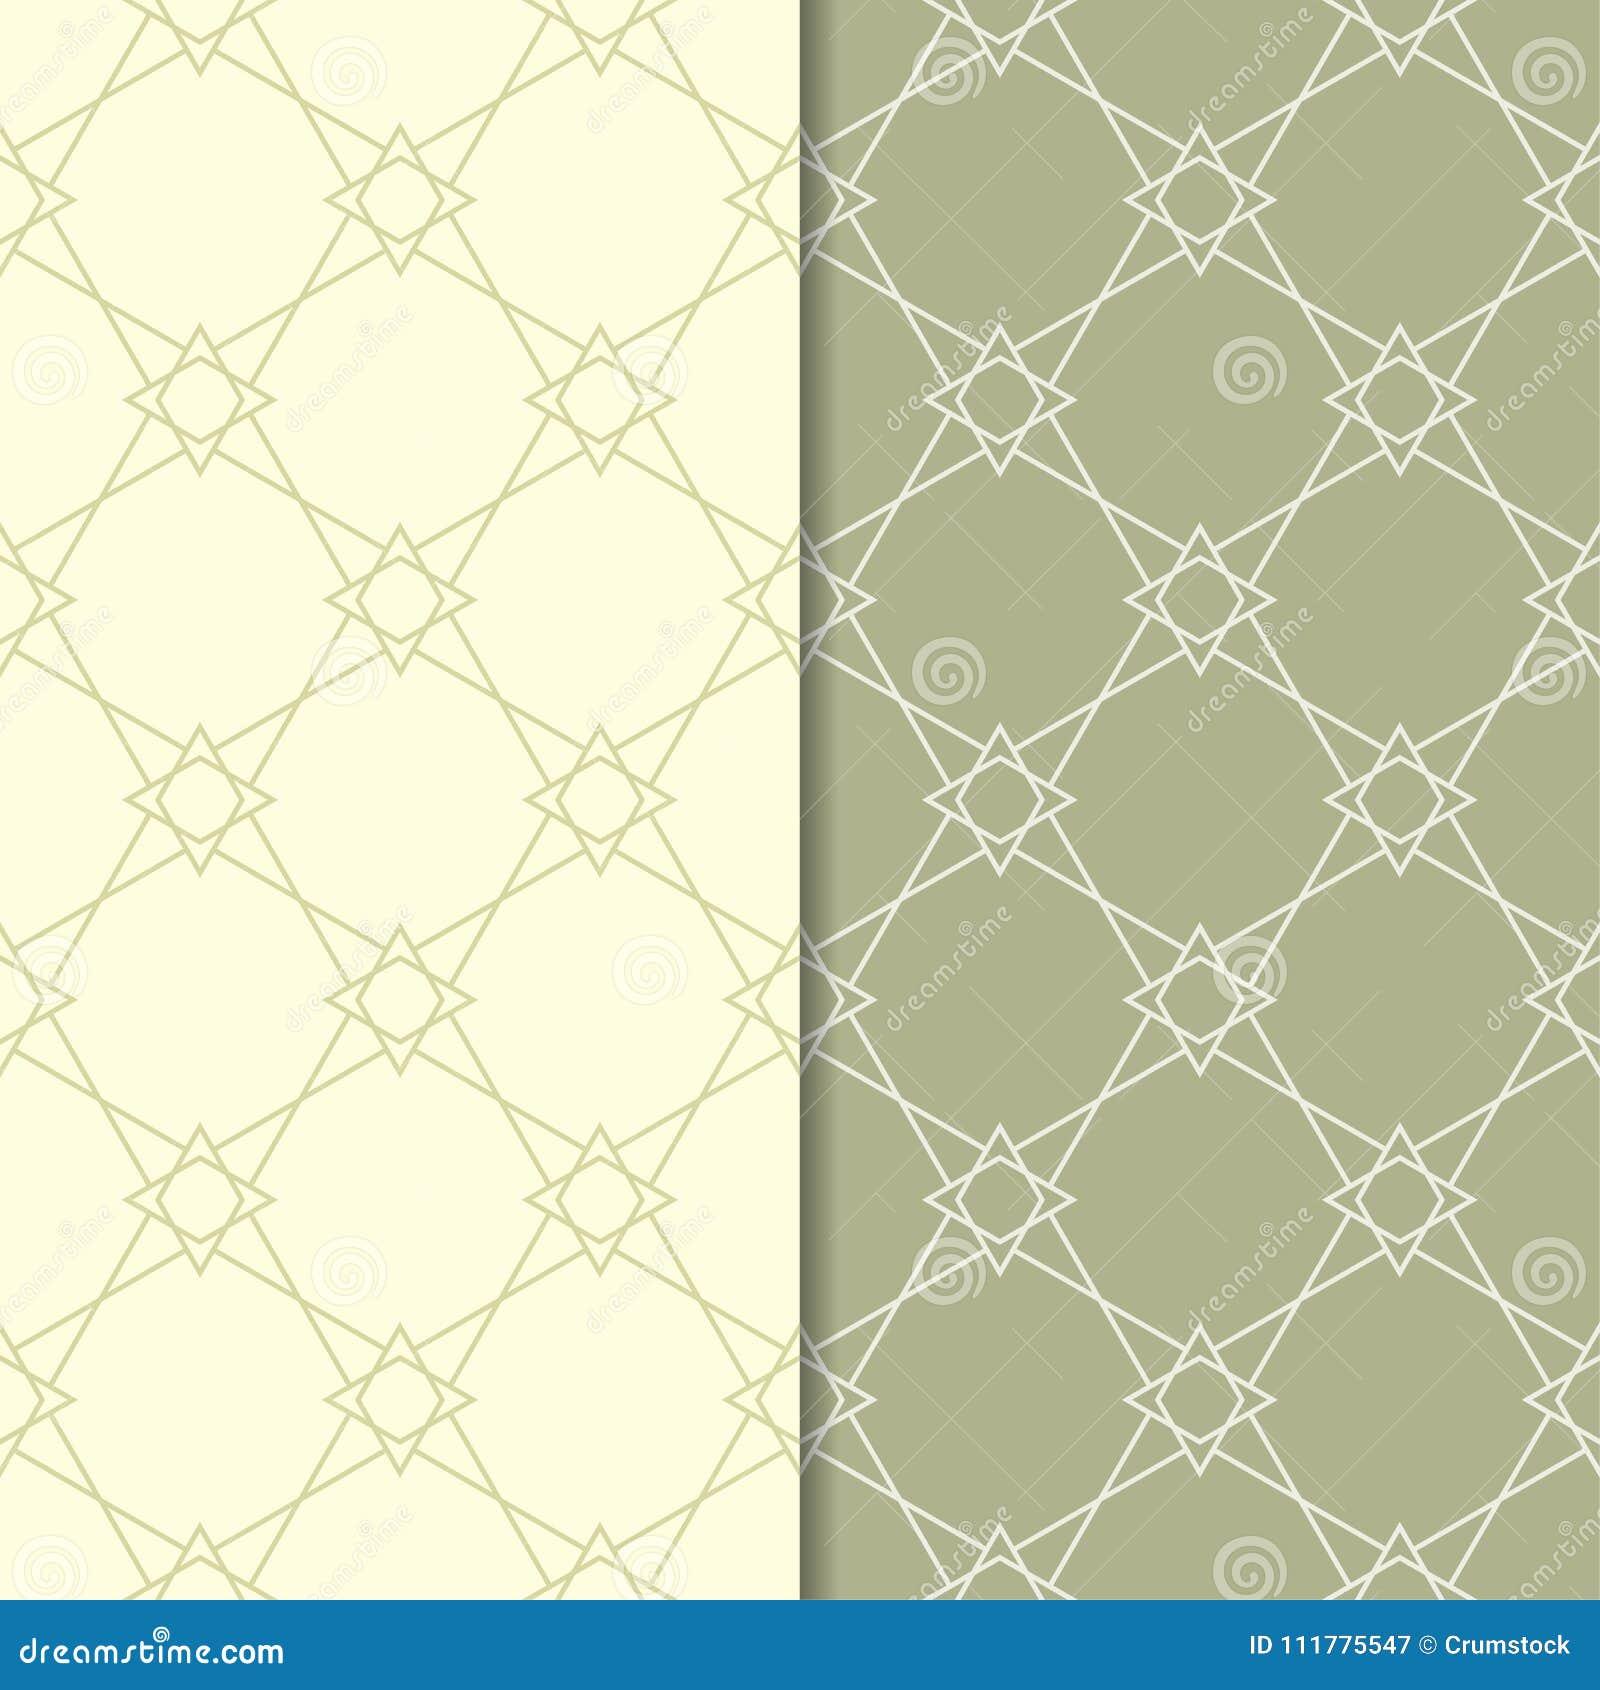 Set of geometric ornaments. Olive green seamless patterns